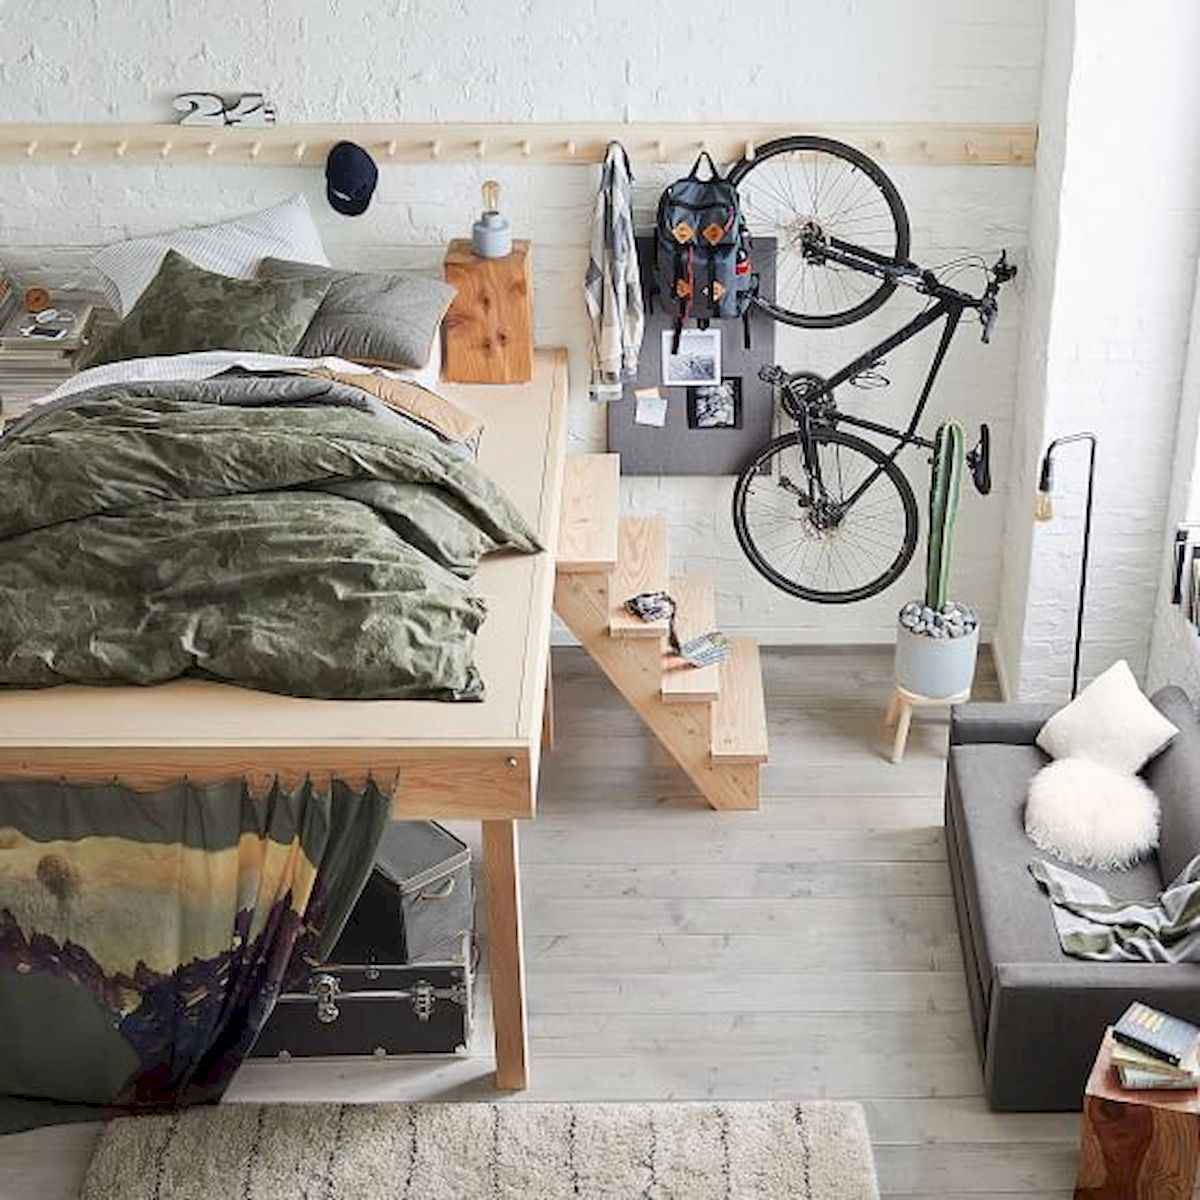 80 Fantastic Small Apartment Bedroom College Design Ideas and Decor (12)